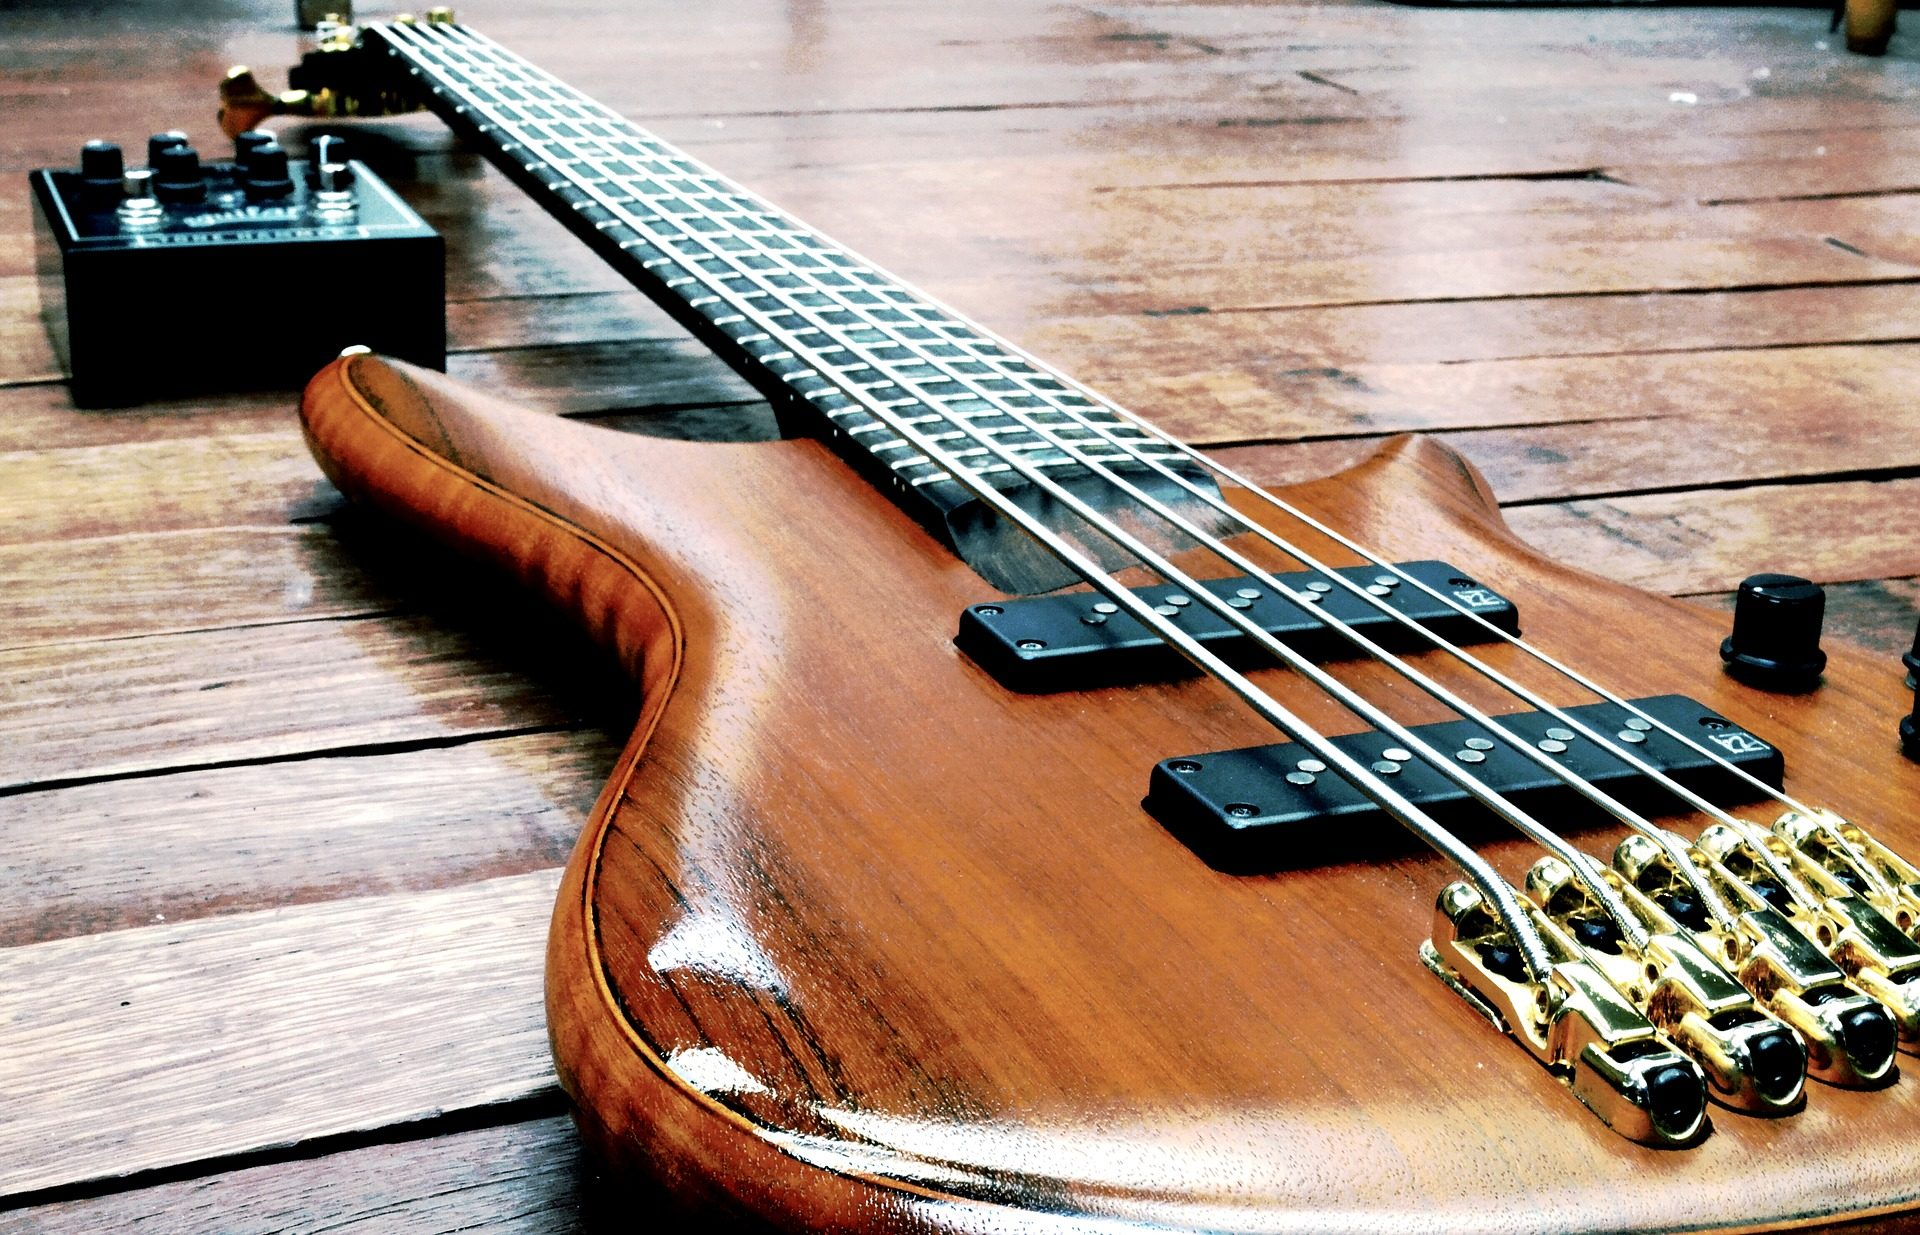 Gitarre, Elektro, Streicher, Holz, Boden - Wallpaper HD - Prof.-falken.com